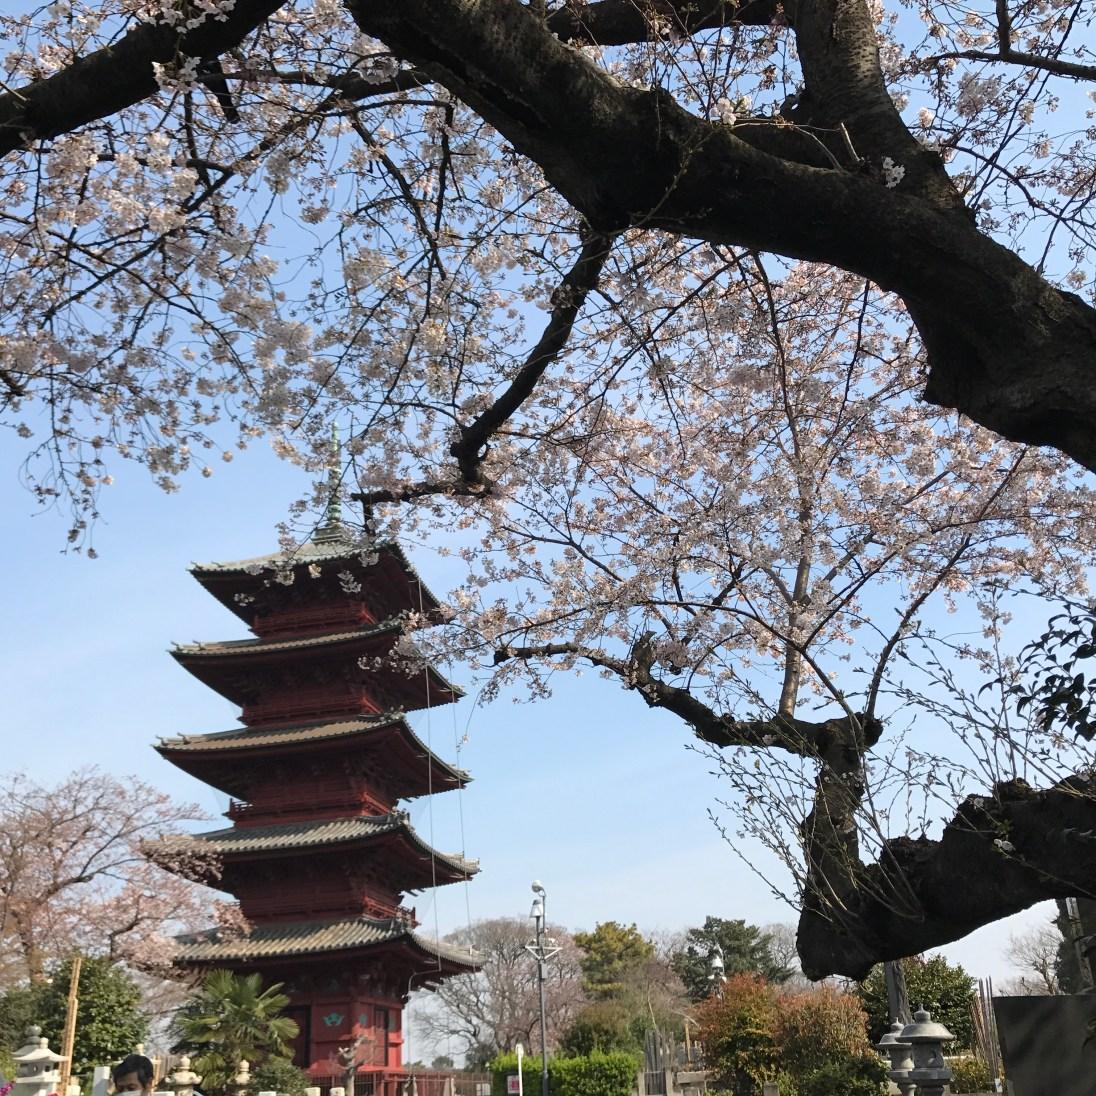 Ikegami Honmon-ji five-story pagoda